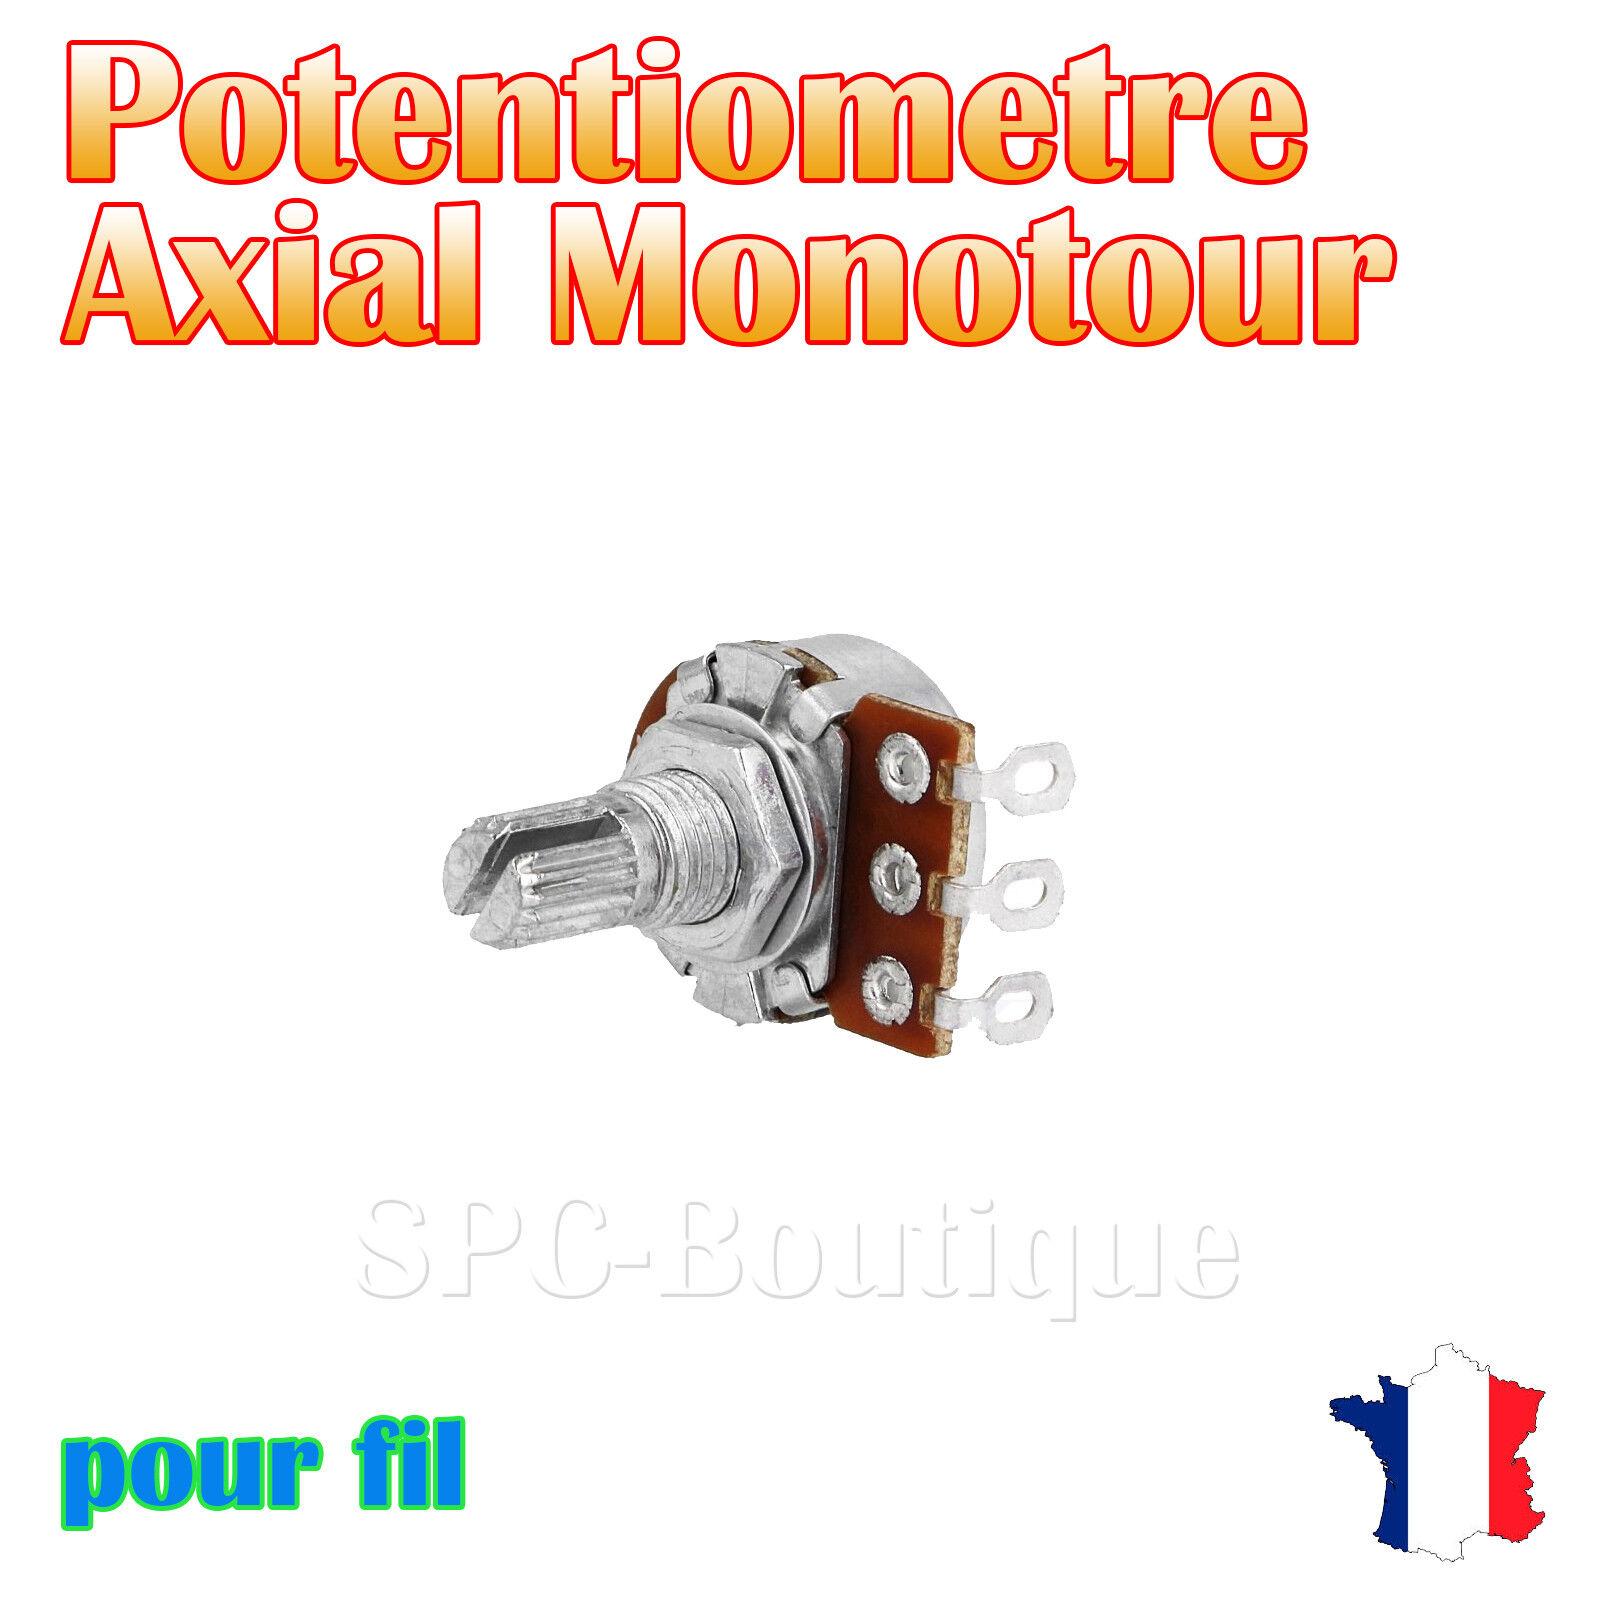 1x Potentiomètre mono logarithmique Axial 220KΩ (A220K), pour fil fil fil a soudé d11716